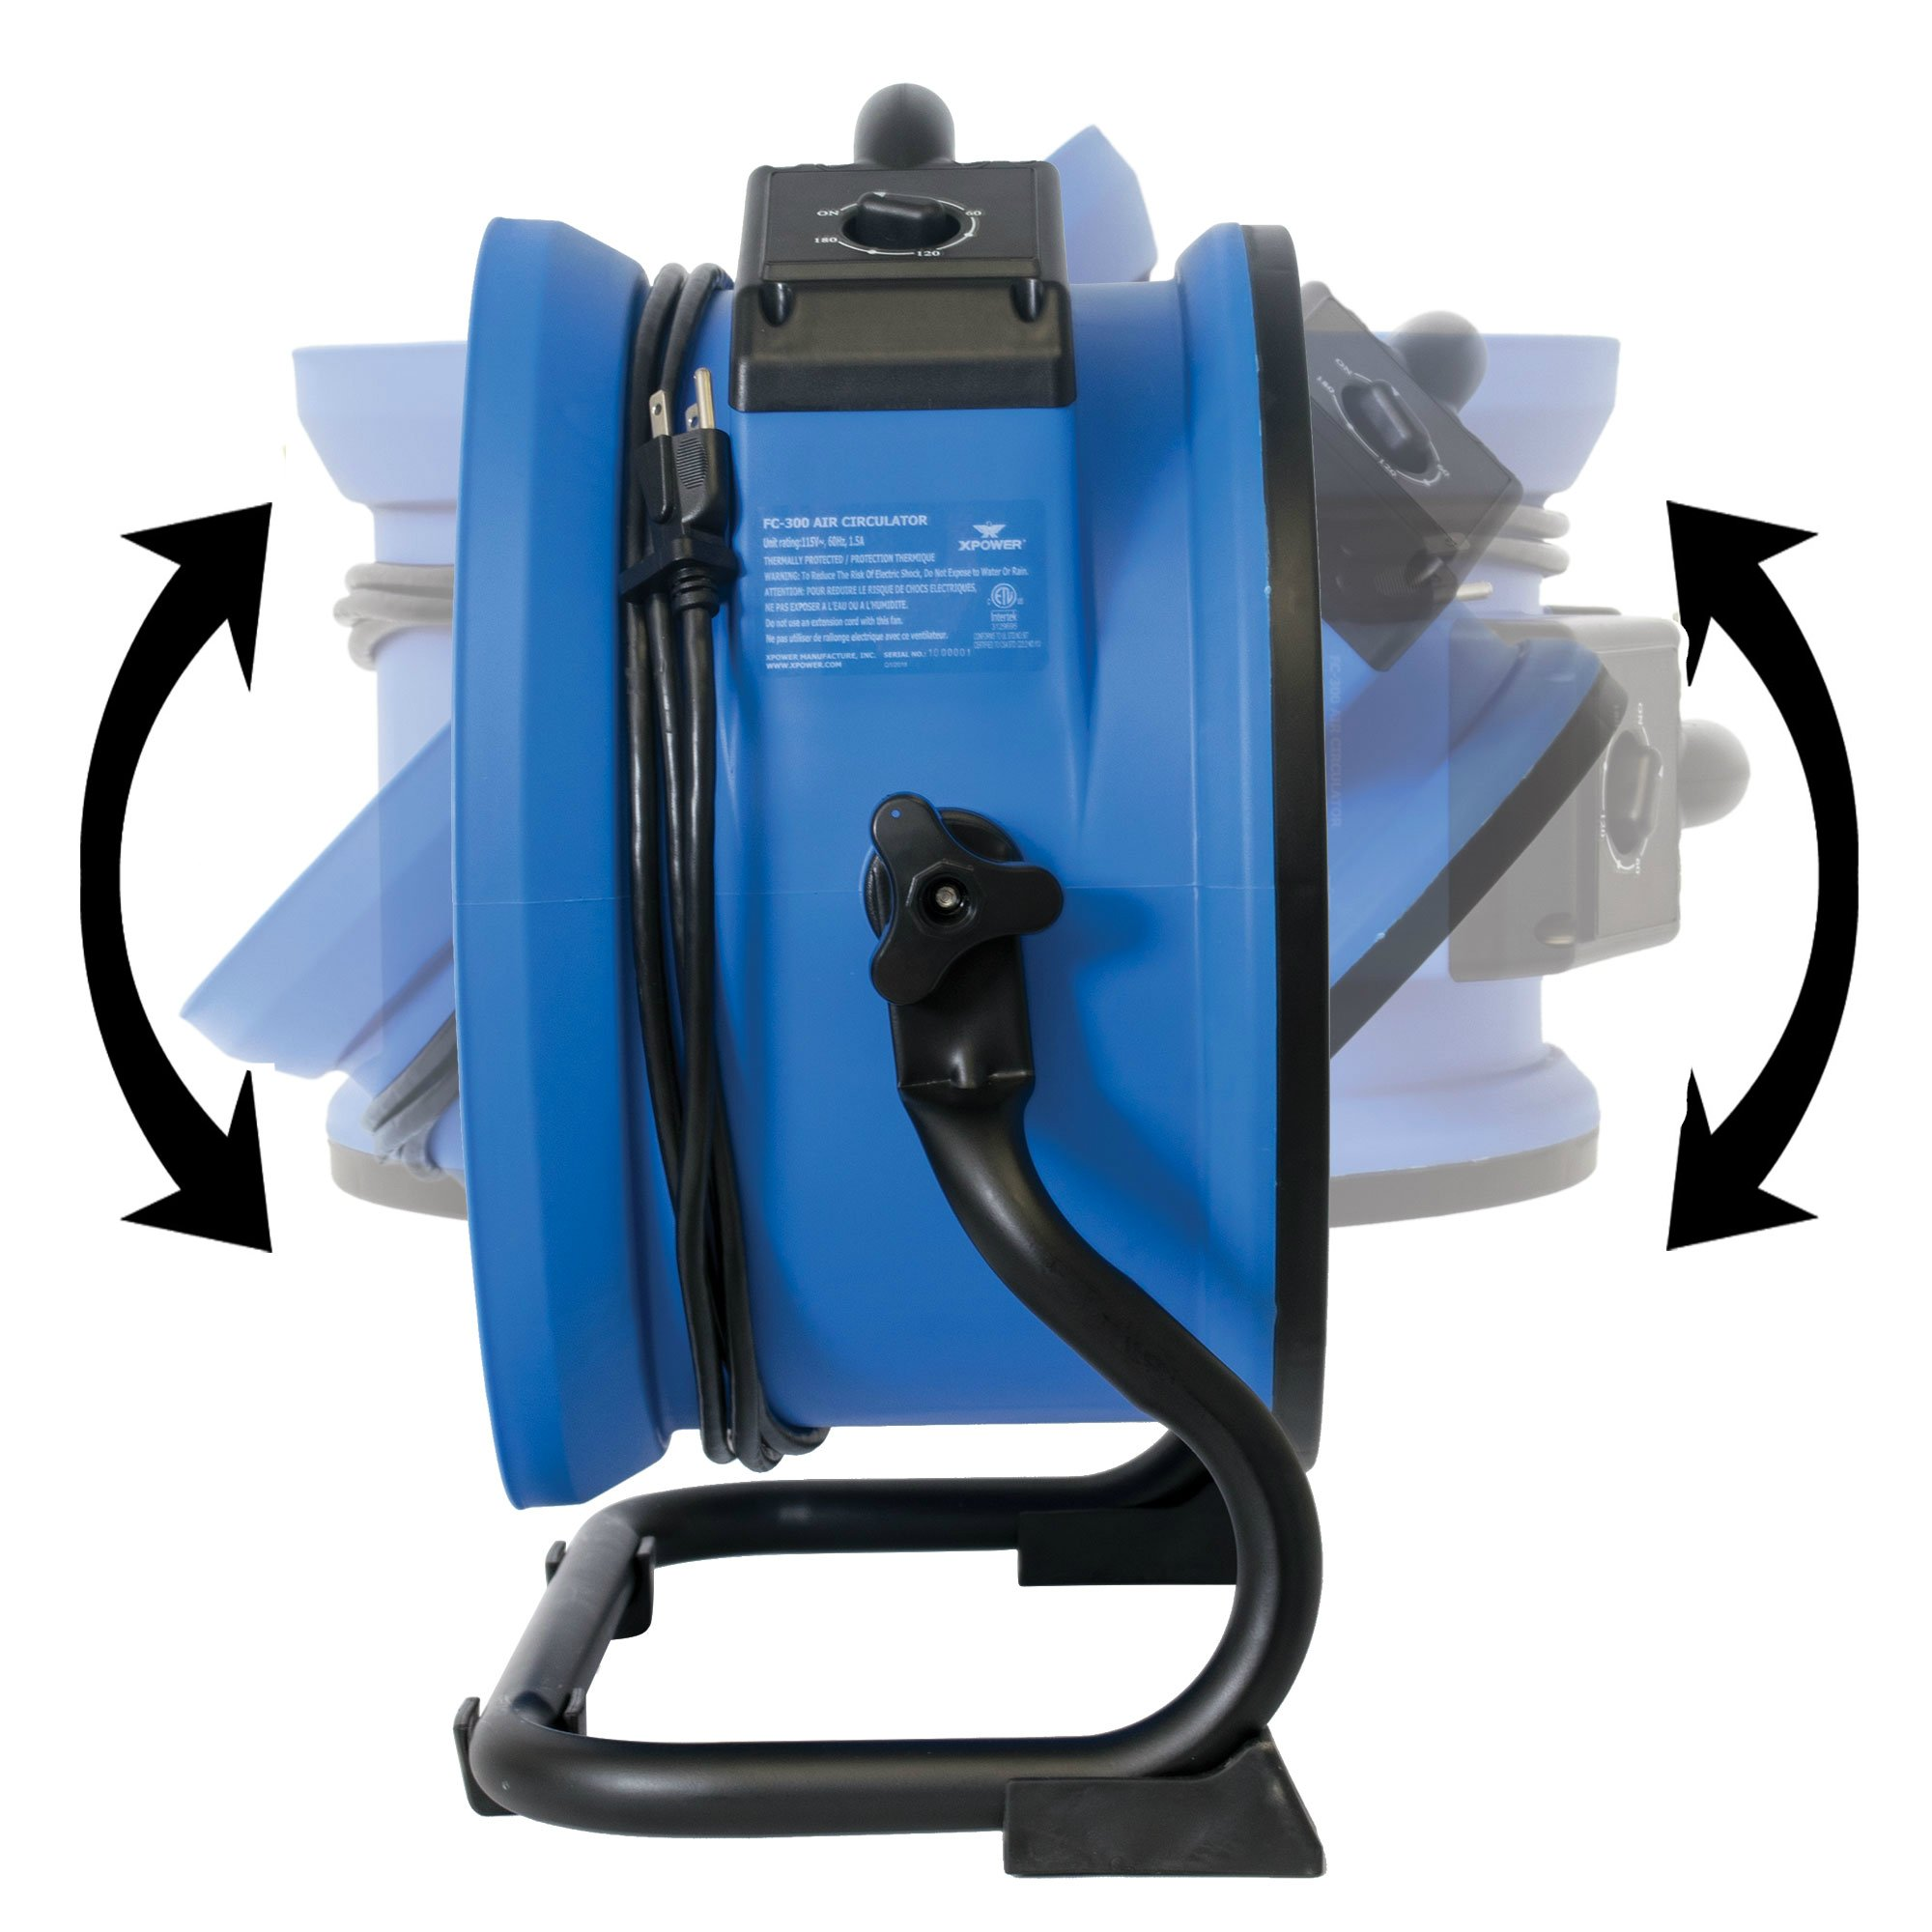 XPOWER FC-300 Professional Grade Air Circulator, Utility Fan, Carpet Dryer, Floor Blower-14 Diameter Heavy Duty Portable Shop Fan